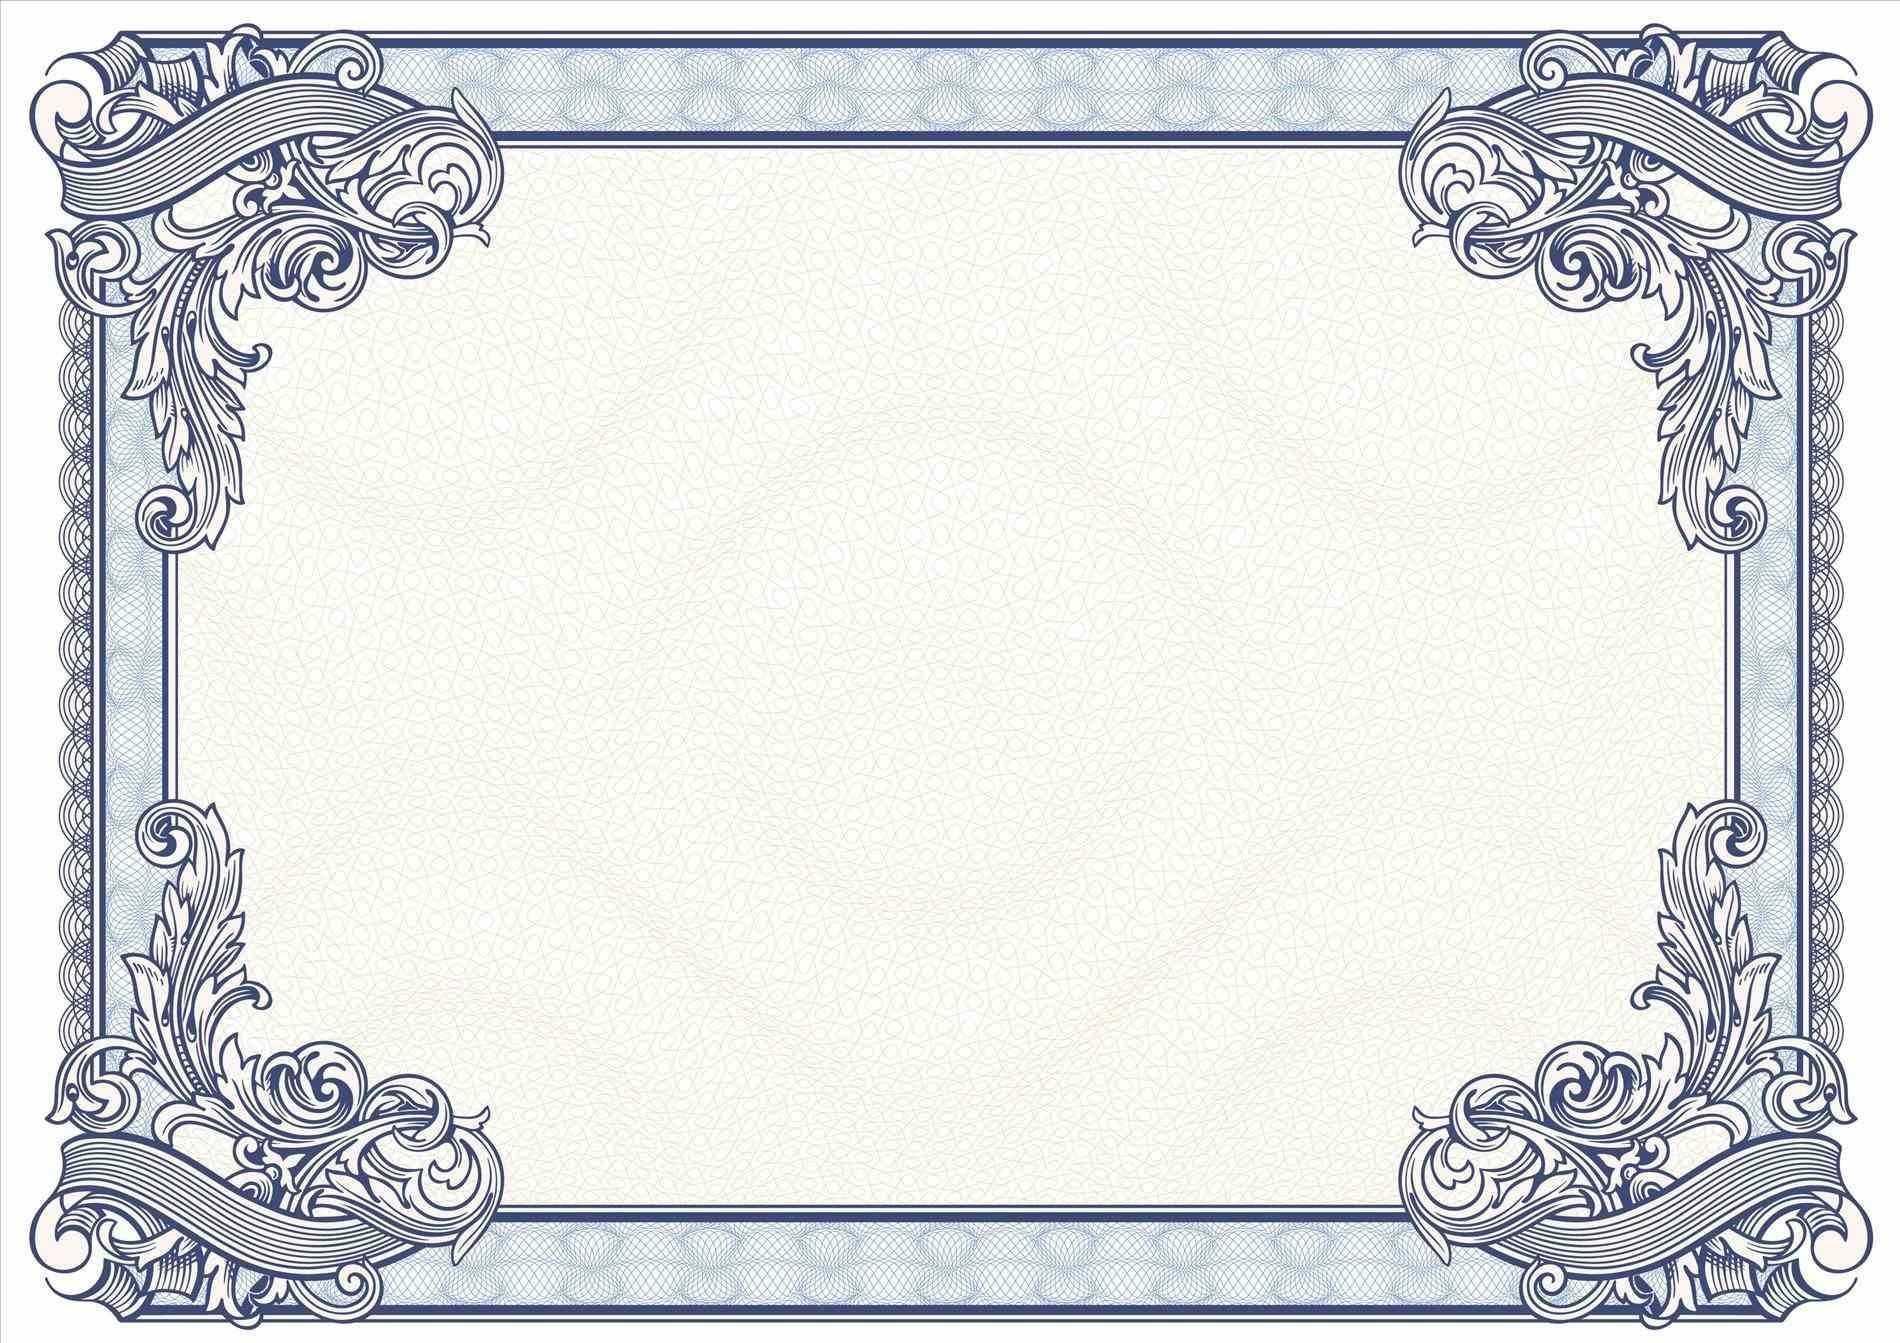 Certificate Borders Design Unique Certificate Border Design In Certificate Border Design Templates